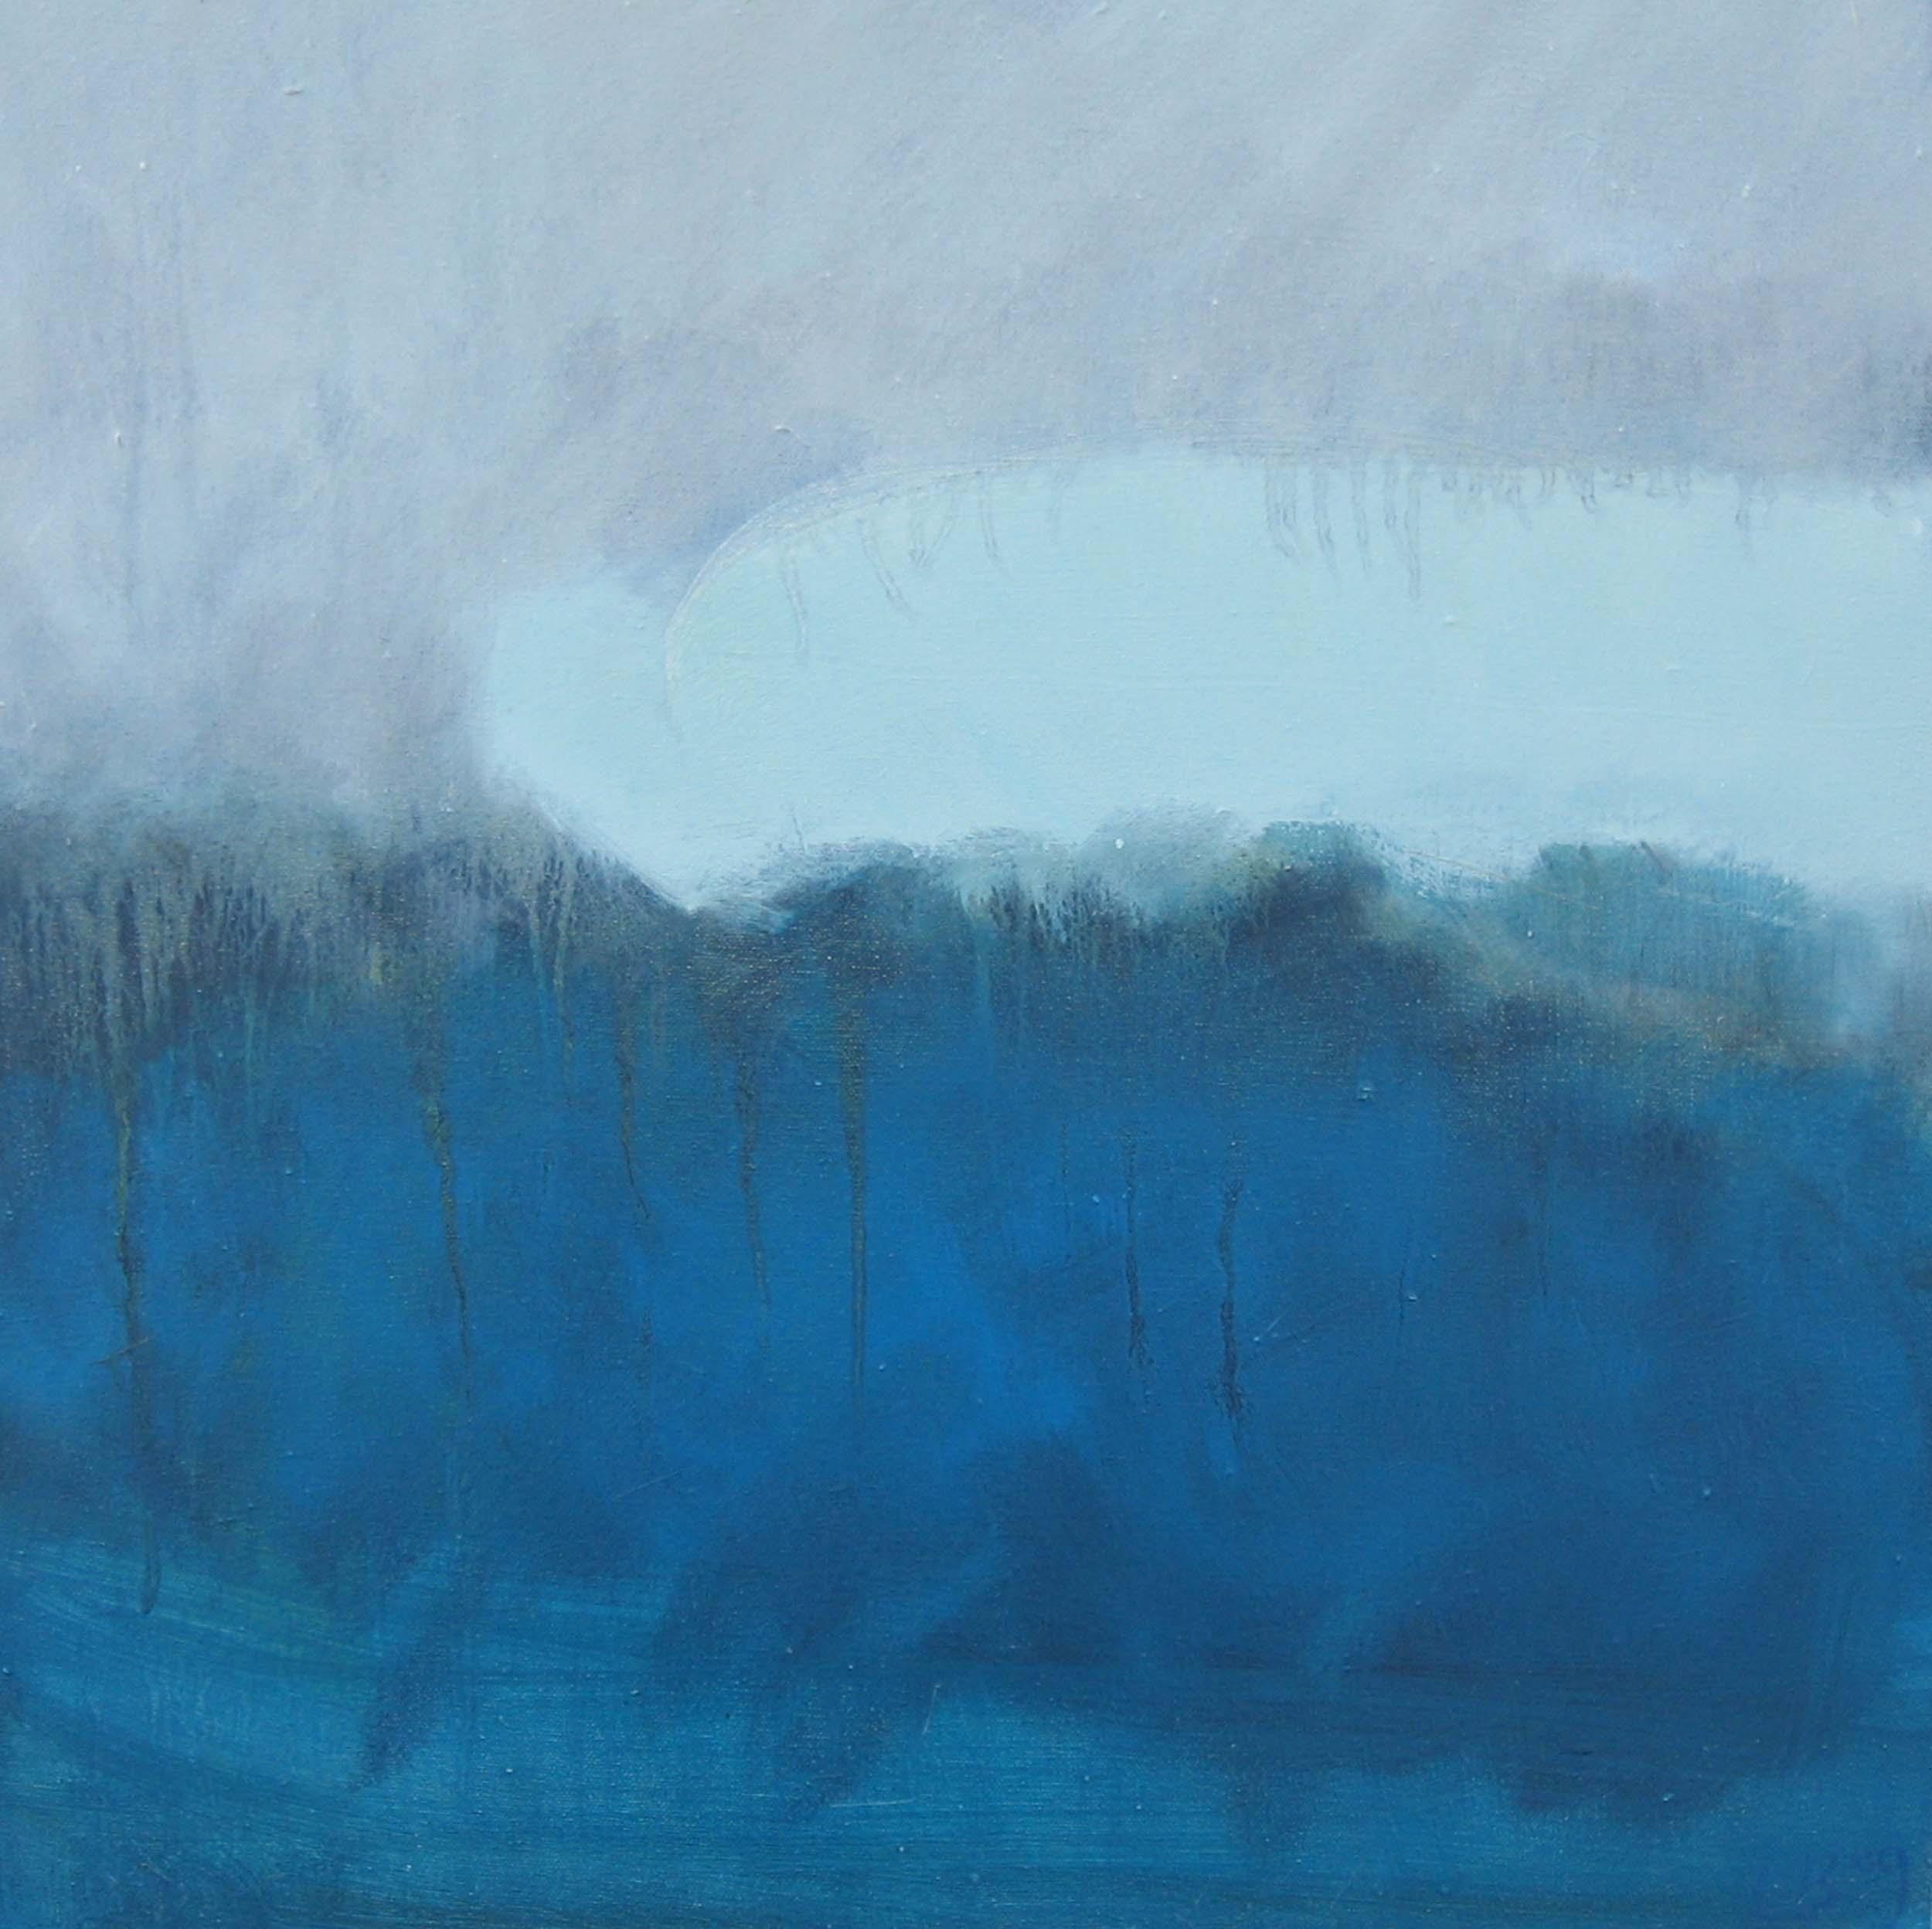 Leah Beggs - Winter Sky over Doire Glinne  - Oil on Canvas - 50 x 50cm_sml.jpg